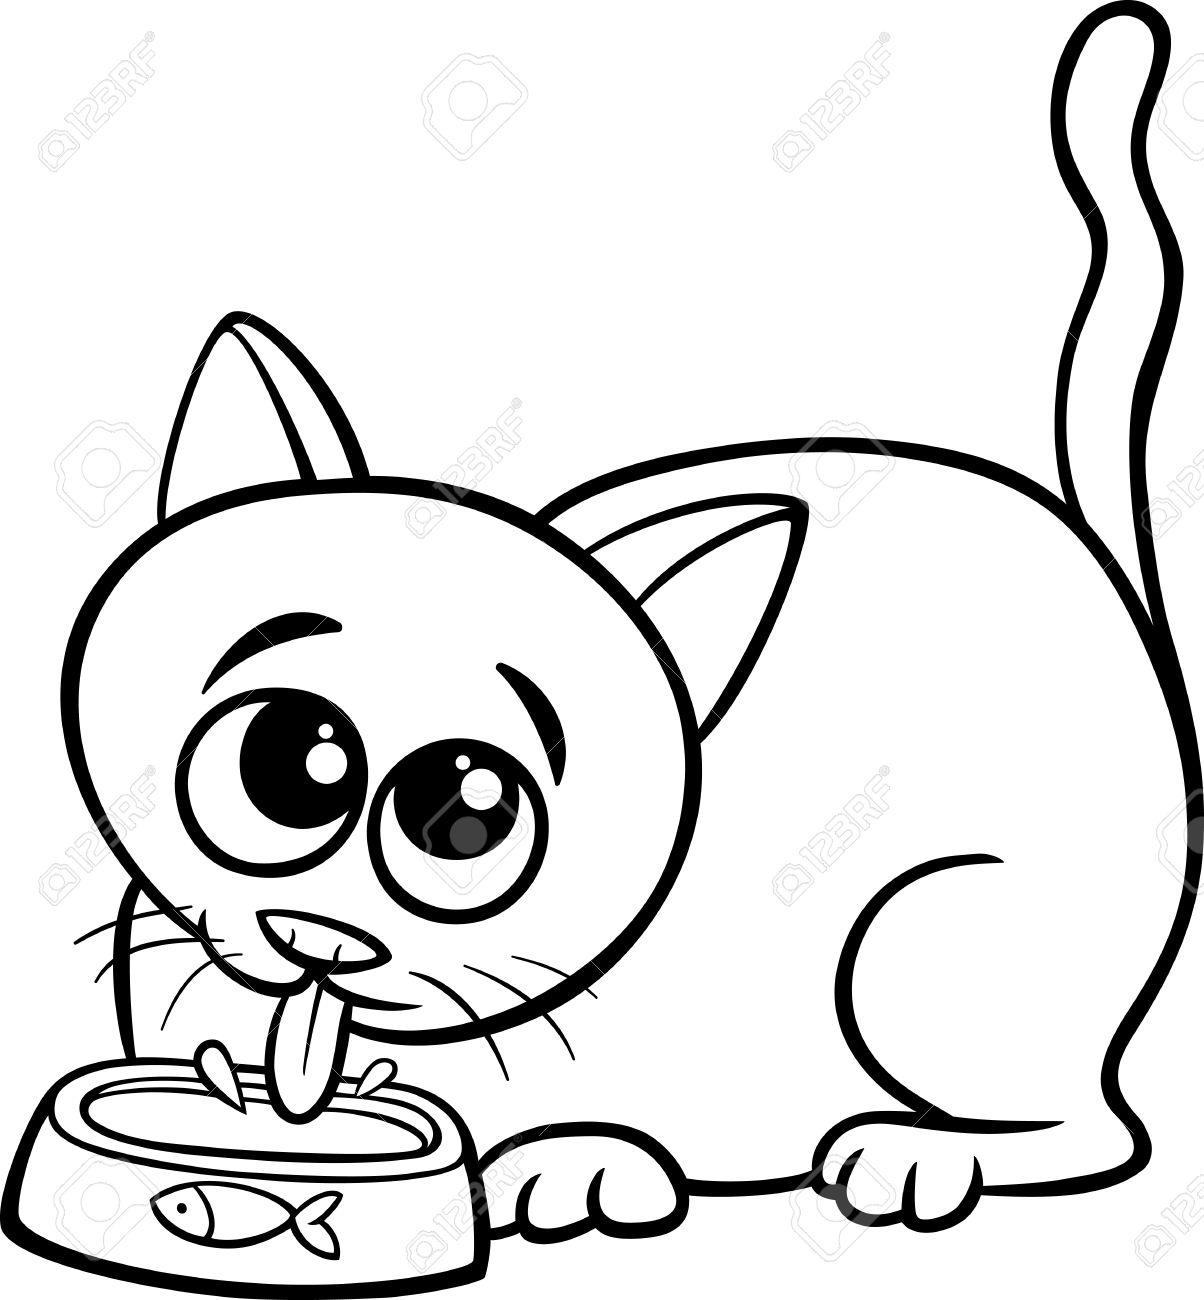 1204x1300 Black And White Cartoon Illustration Of Cute Cat Drinking Milk